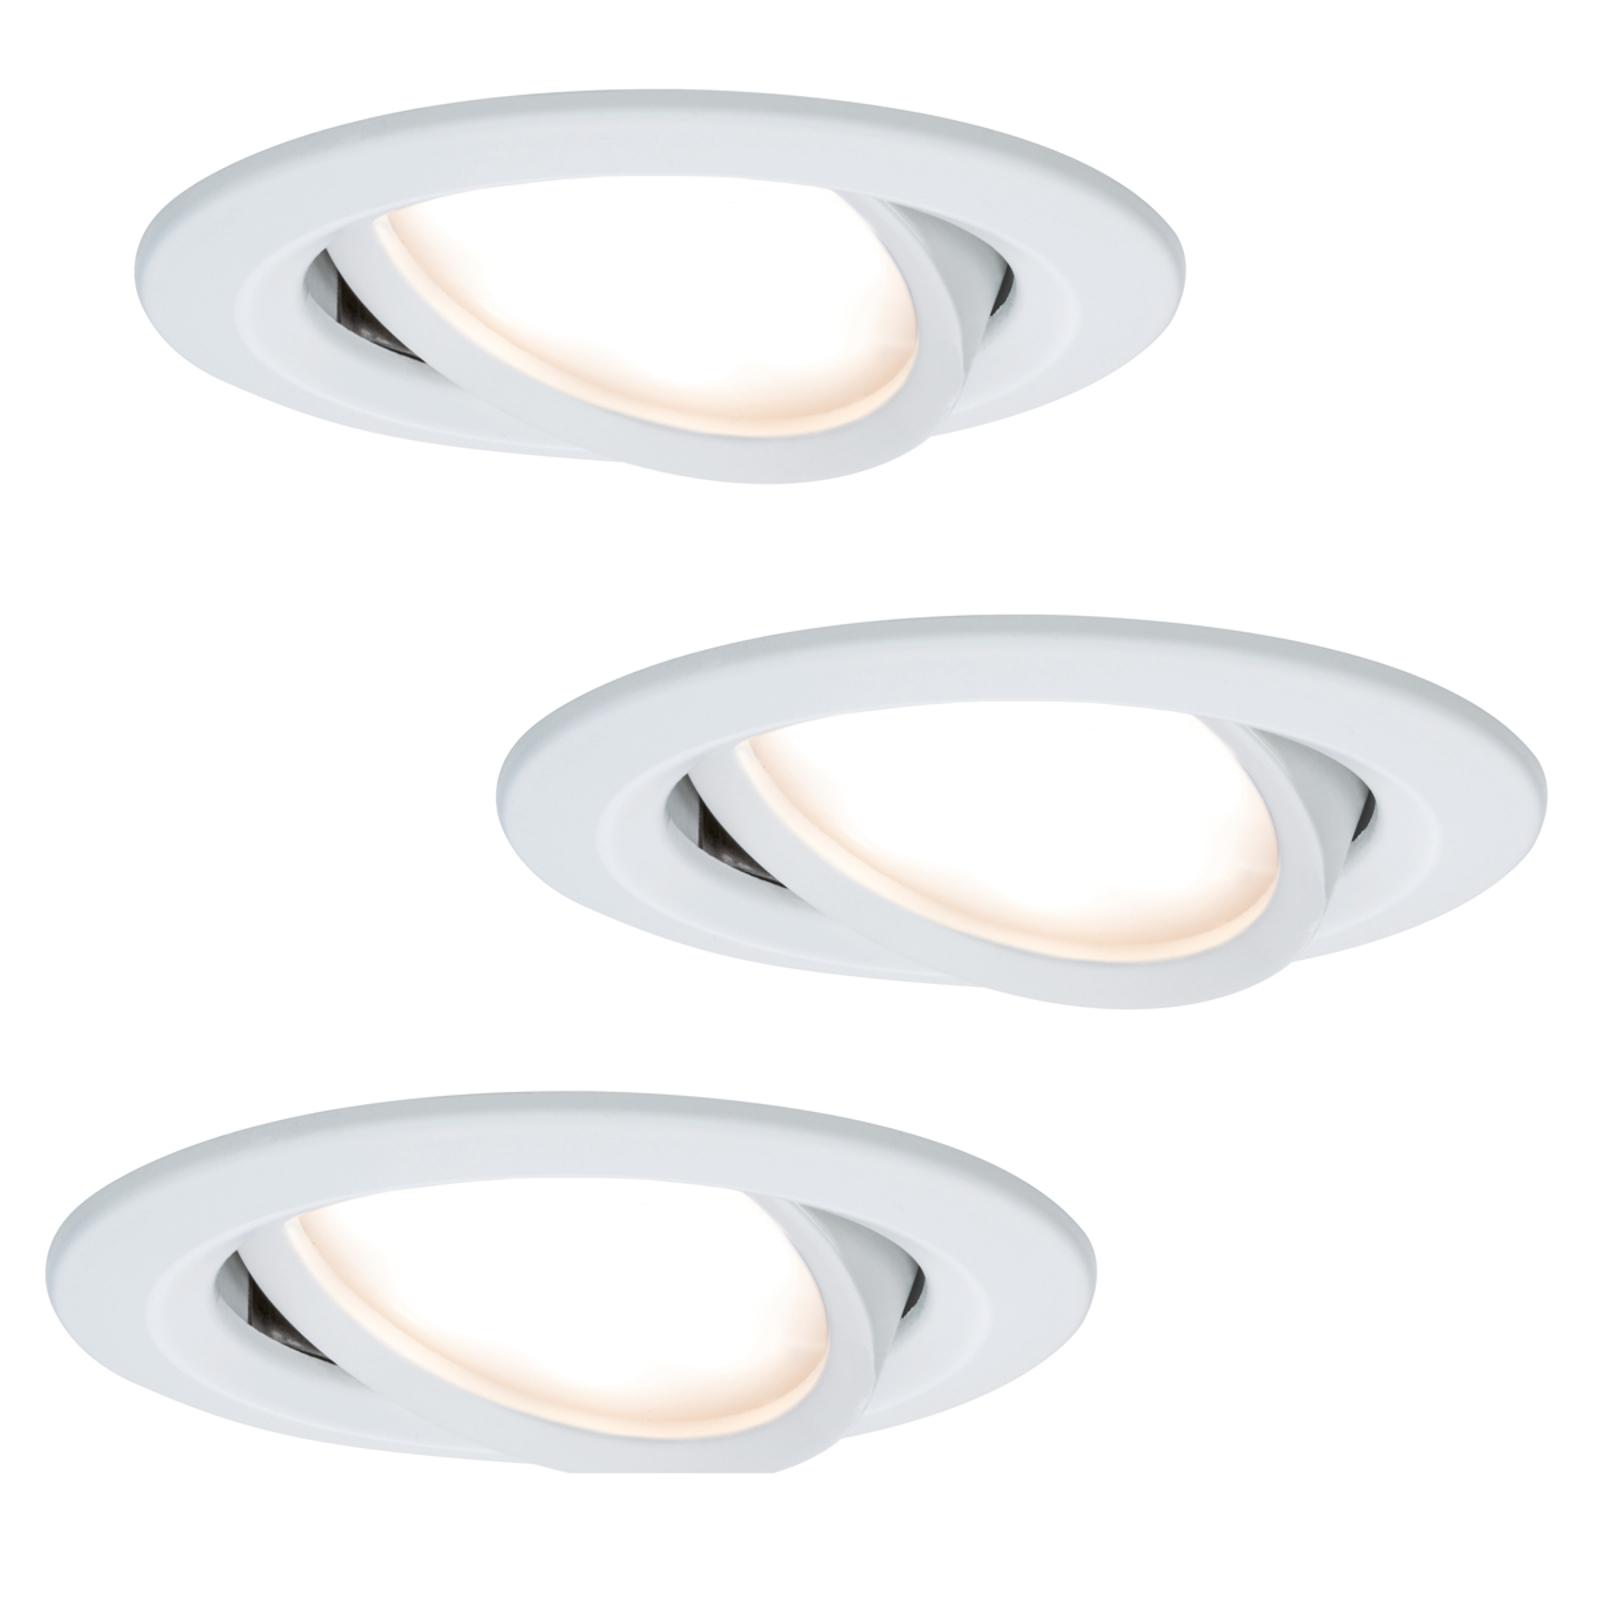 3 spots encastrables LED Coin Slim, blancs, IP23